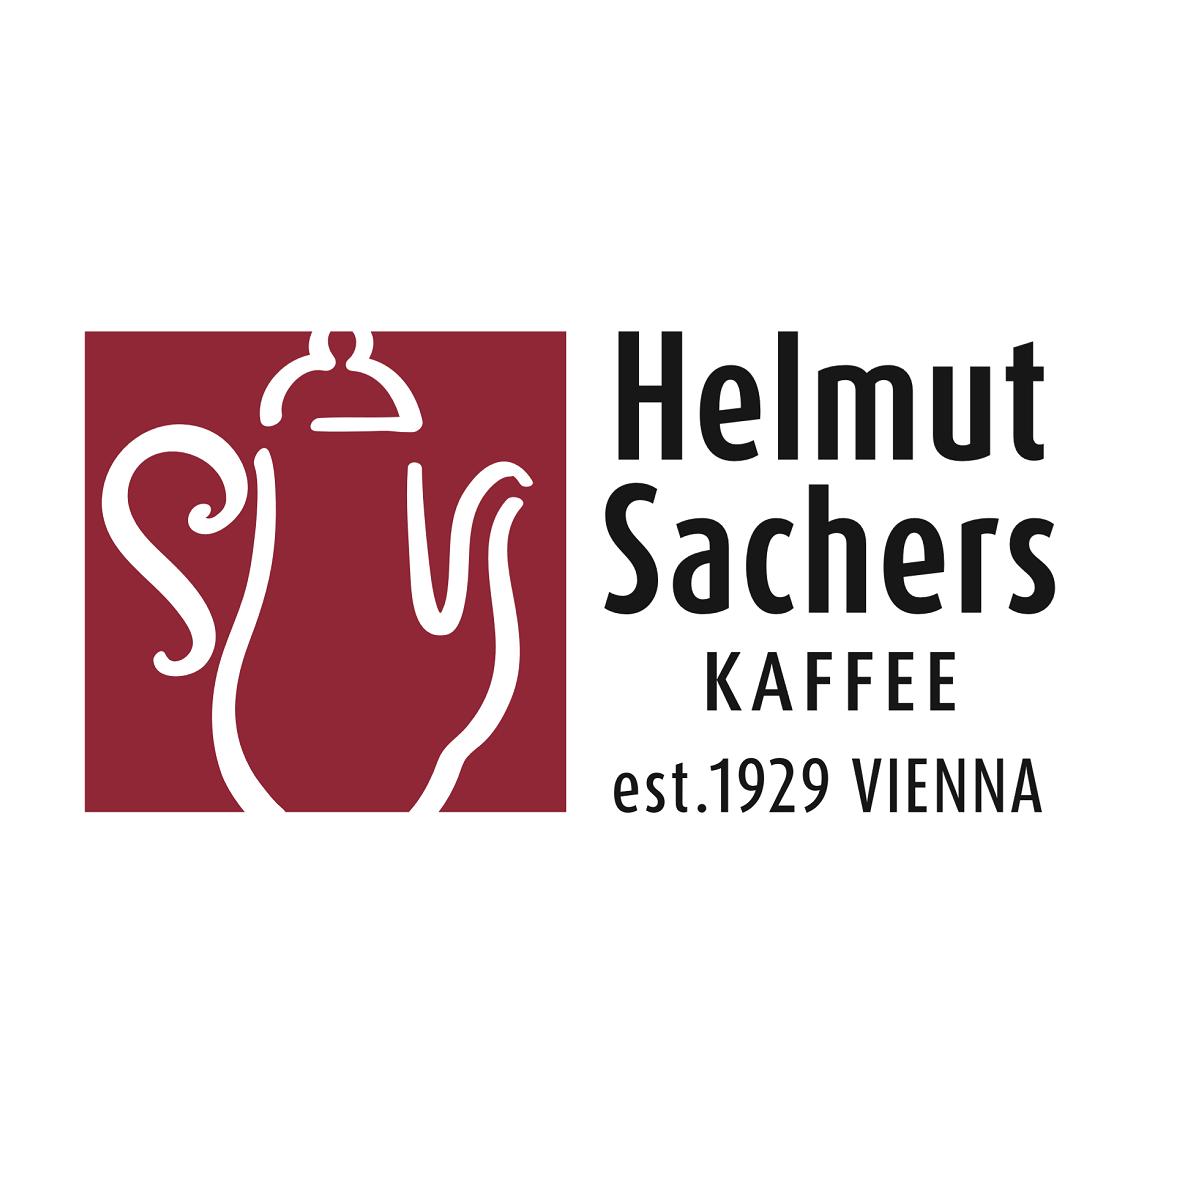 Helmut Sachers Kaffee